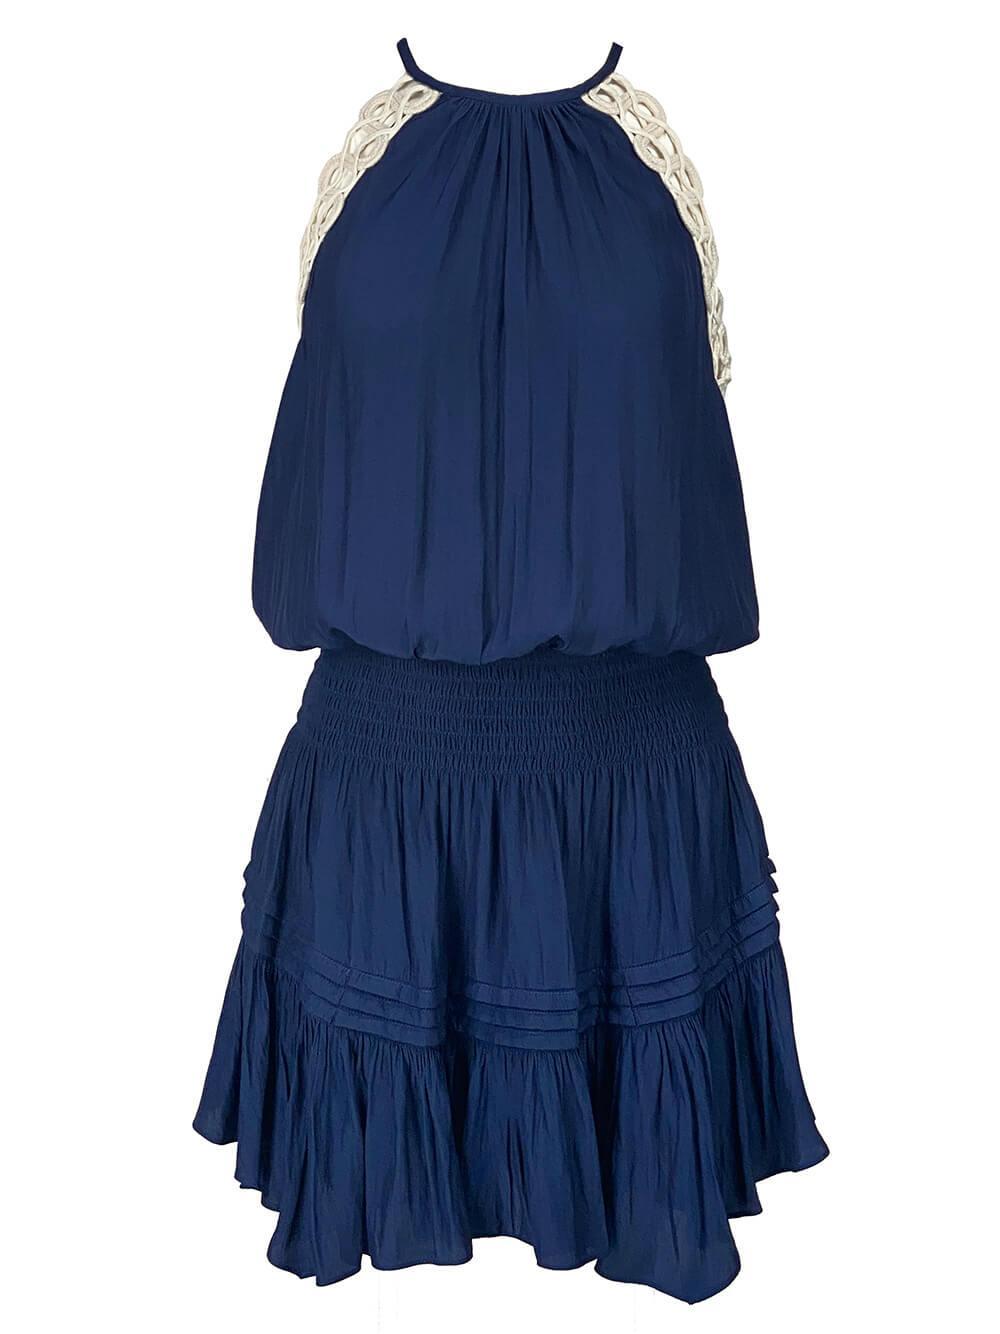 Scottie Dress